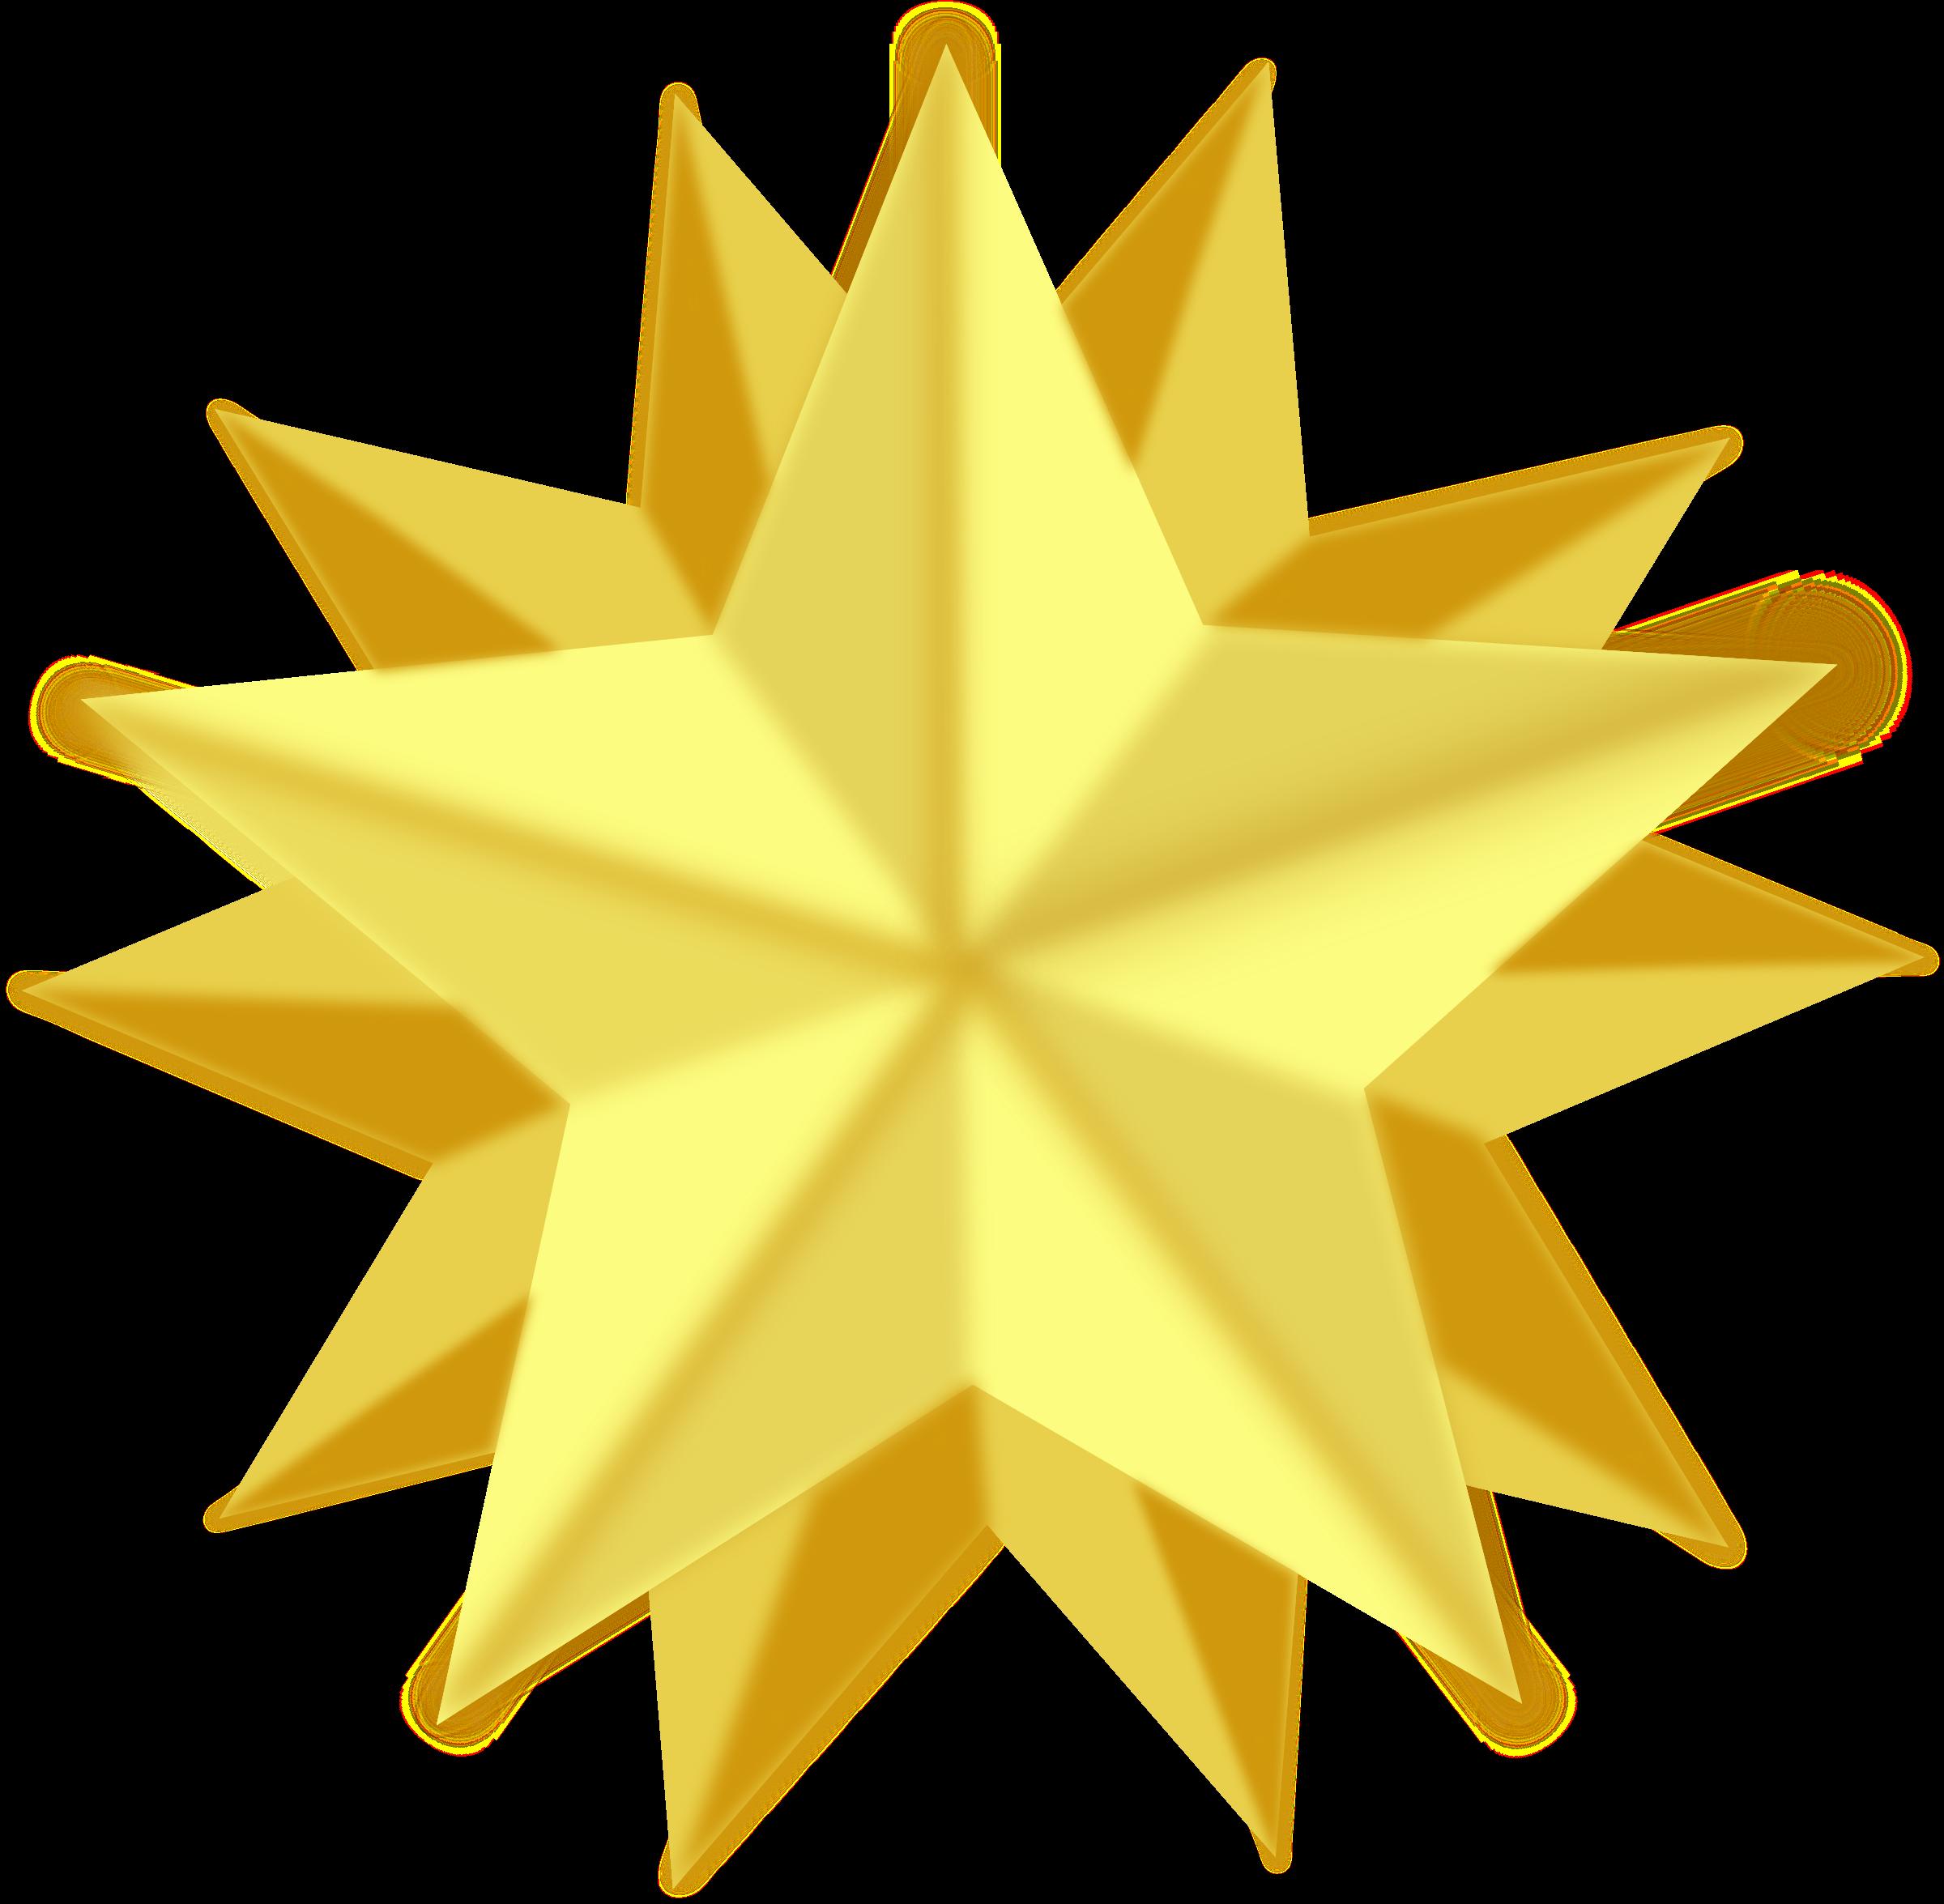 Kawaii star clipart jpg royalty free download Clipart - Golden star jpg royalty free download